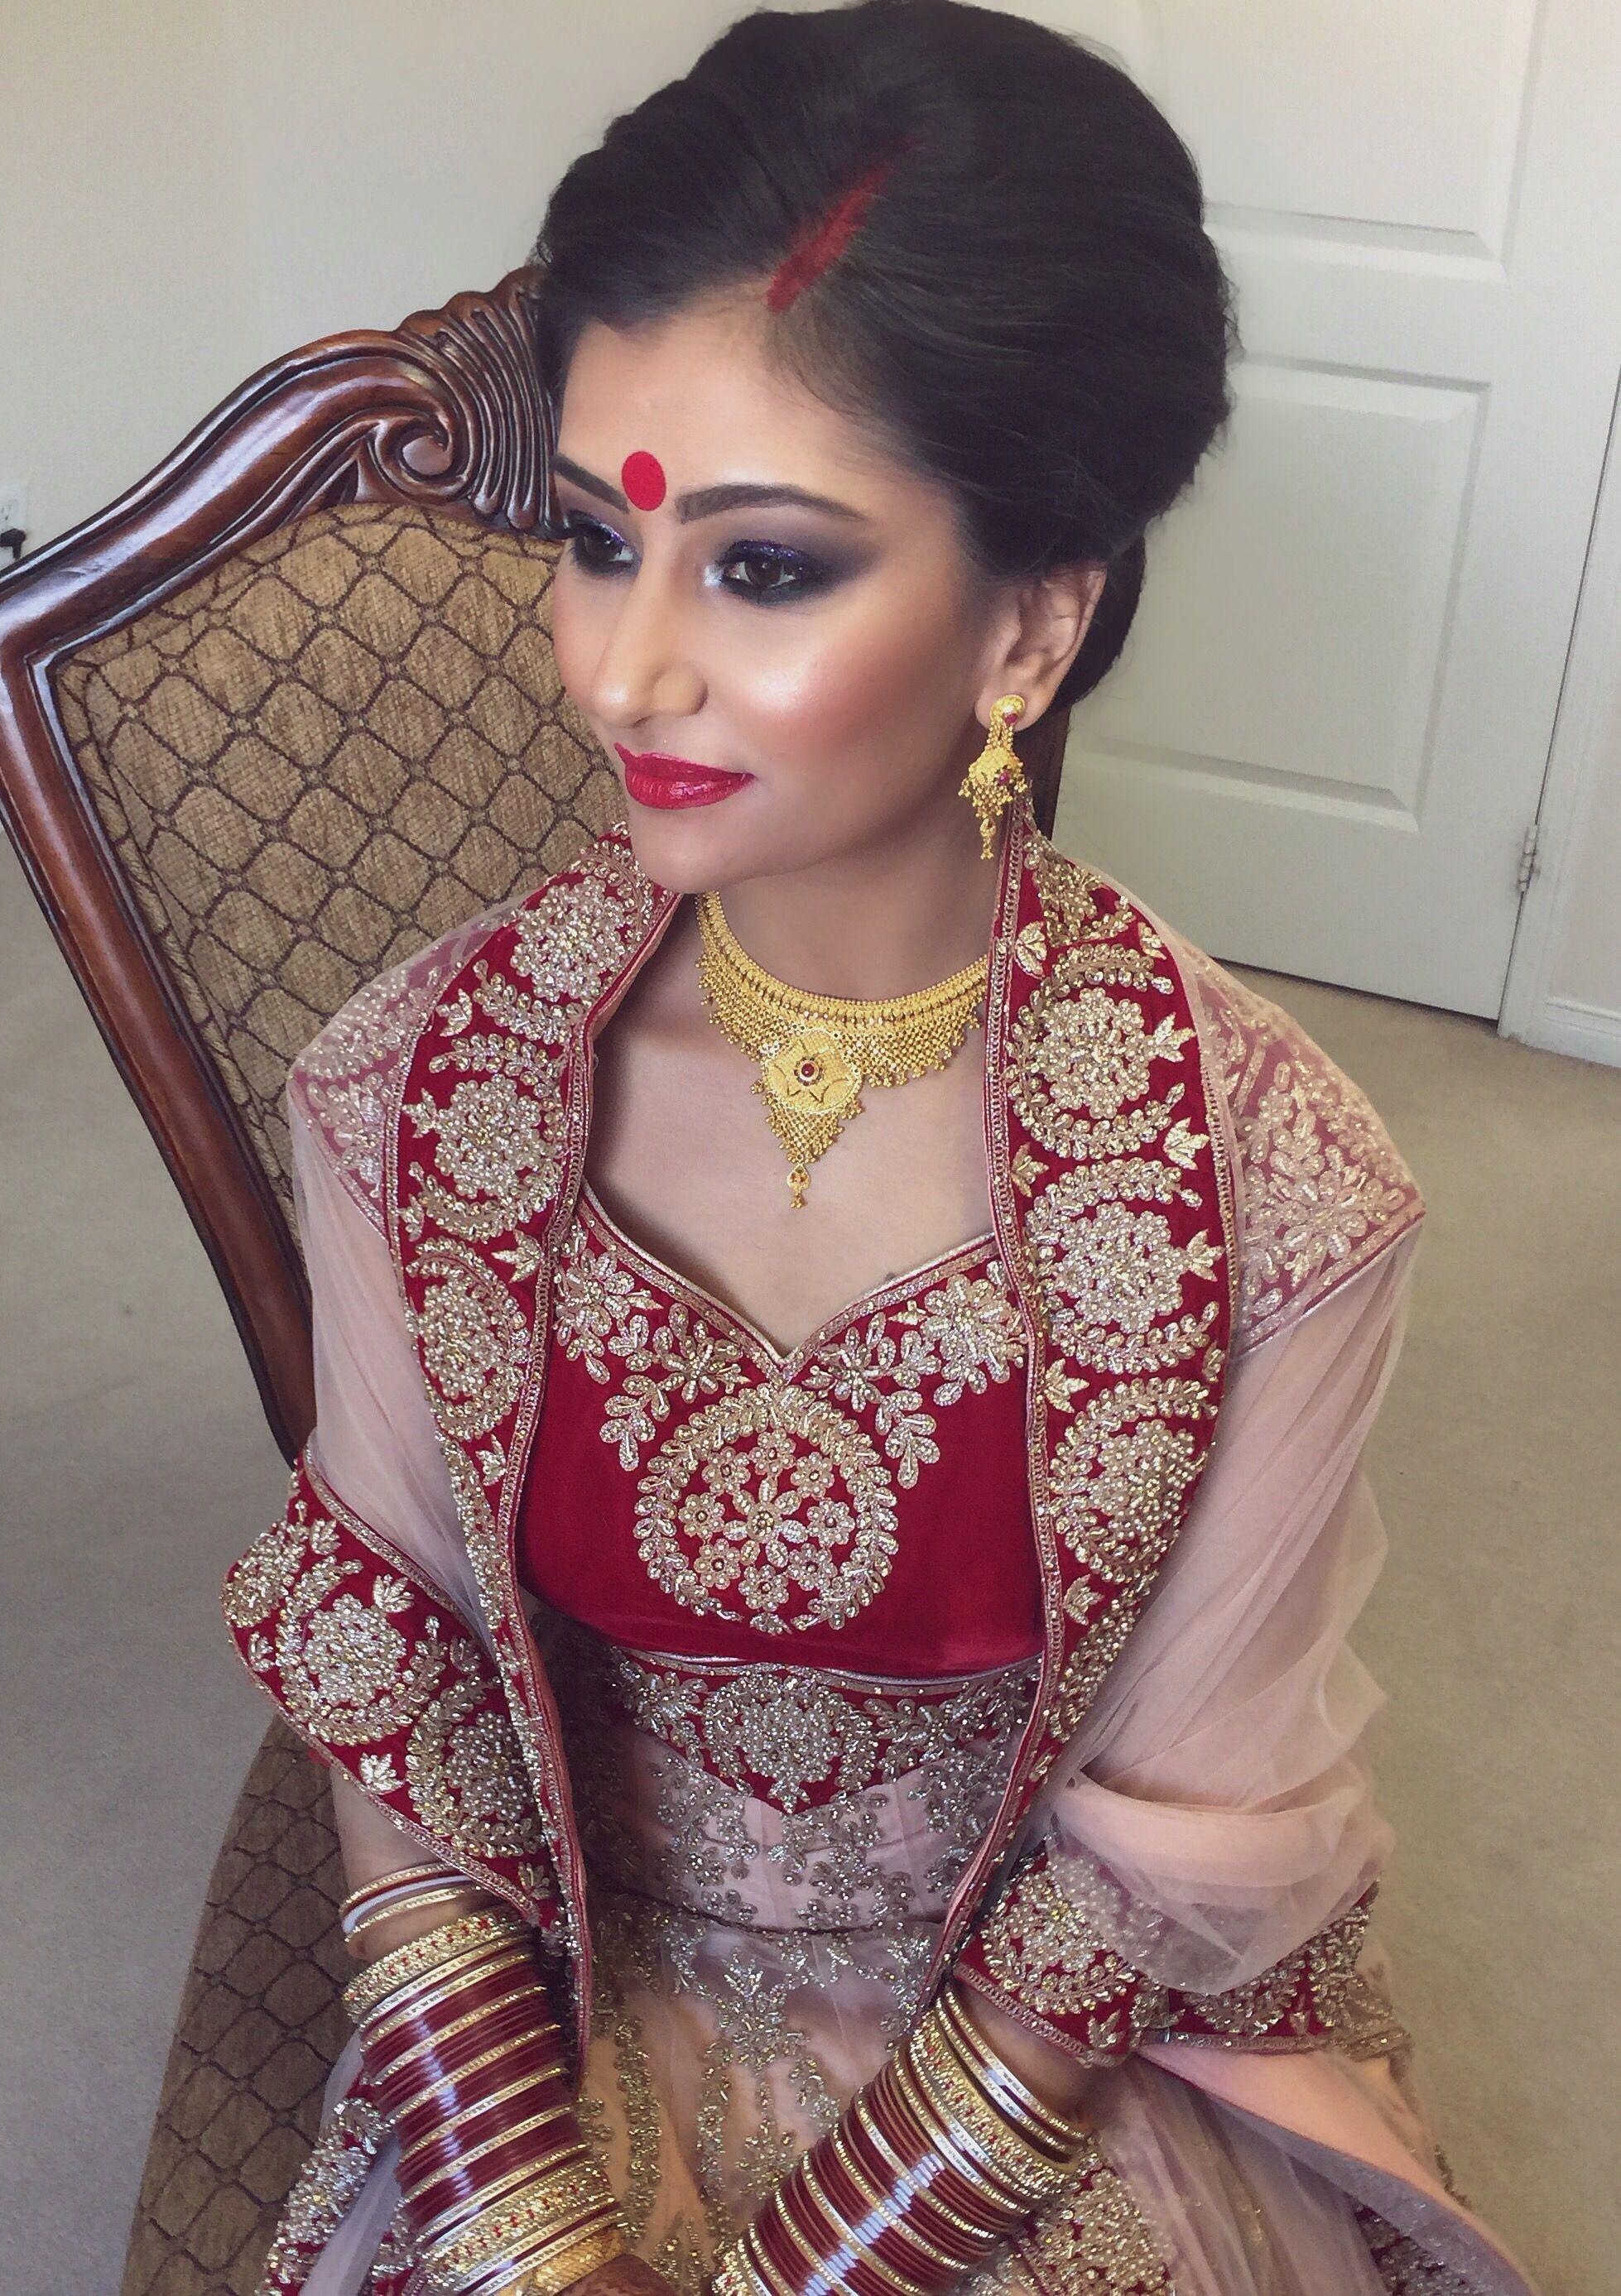 Hair Makeup Www Ravbbeauty Com Makeup Indian Bridal Makeup Indian Bridal Hair Hair Style Indian Bridal Makeup Indian Bridal Hairstyles Bridal Makeup